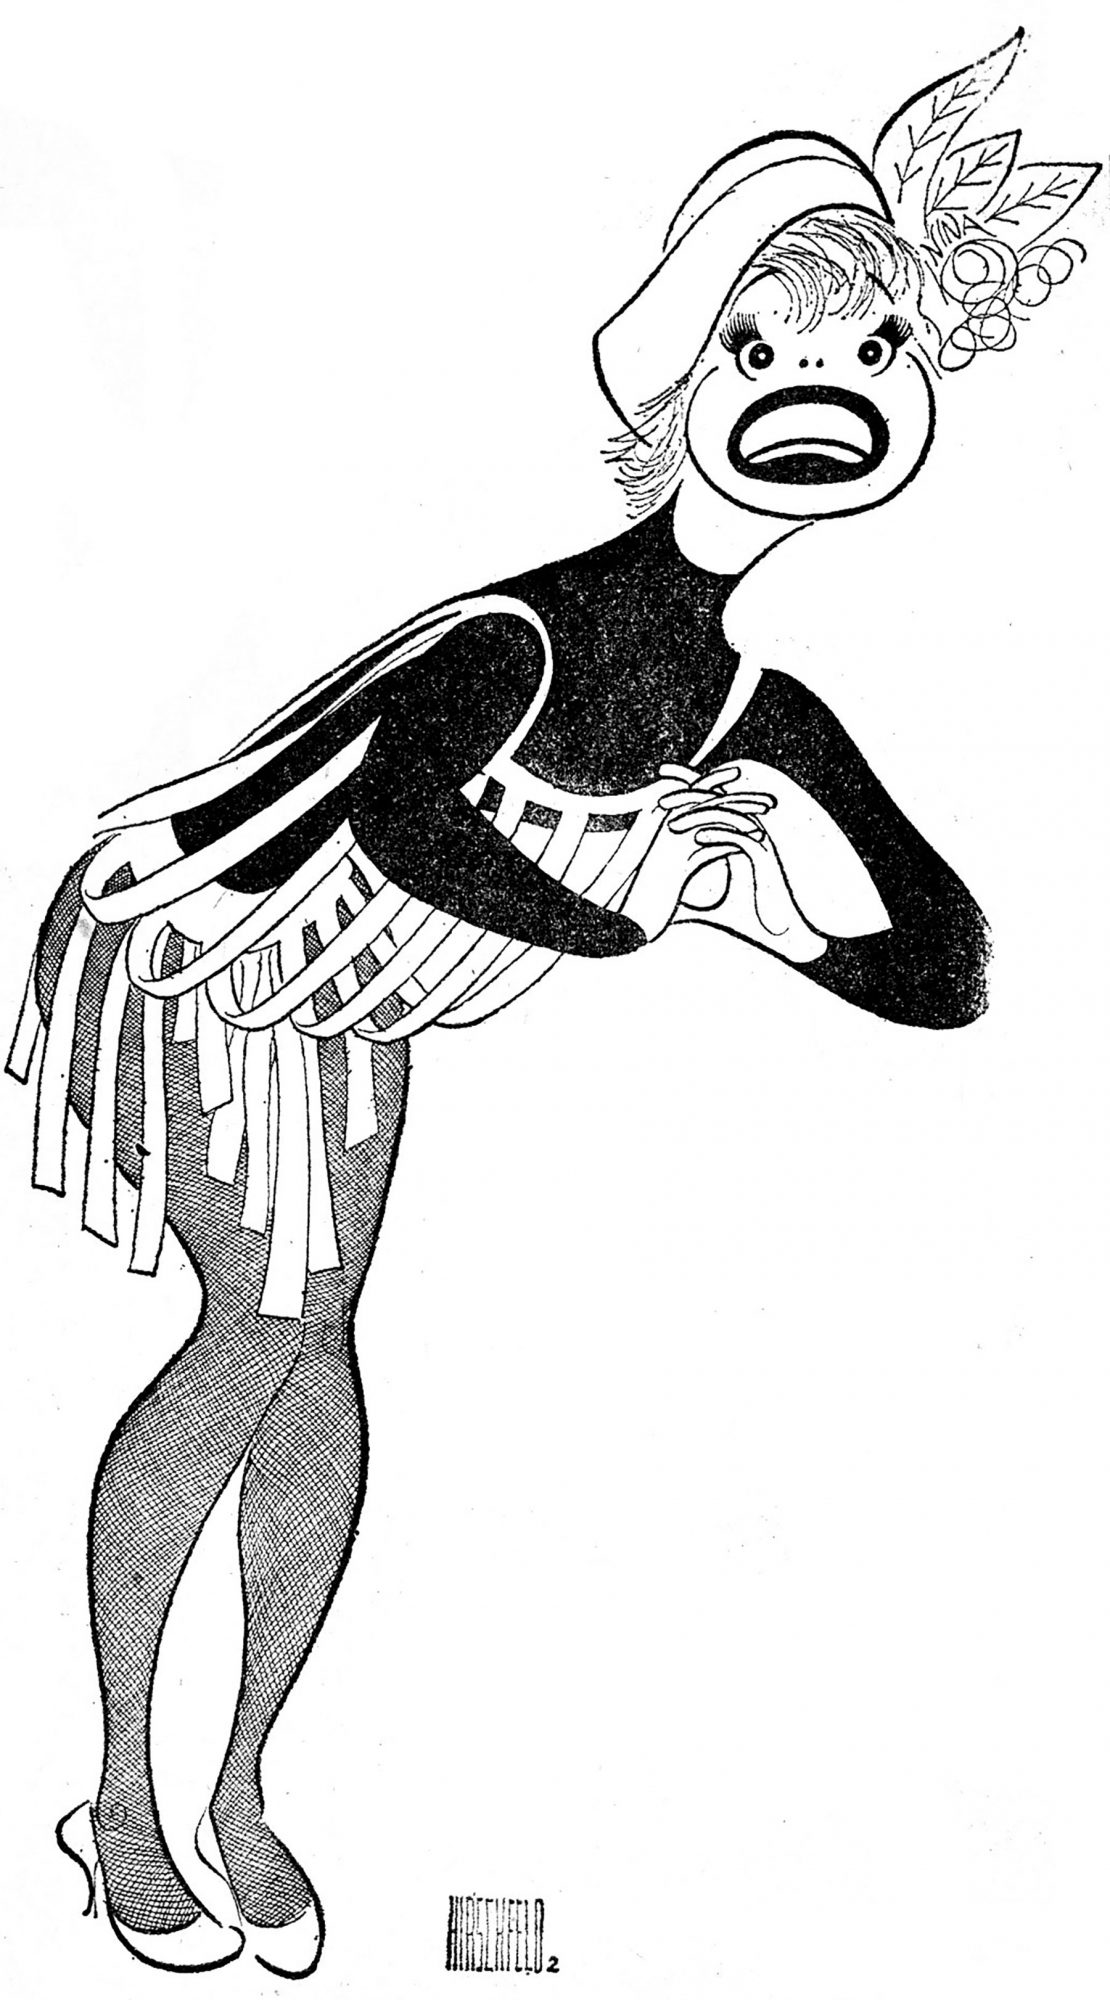 NYT010861C.jpg – Carol Channing in Show Girl, 1961